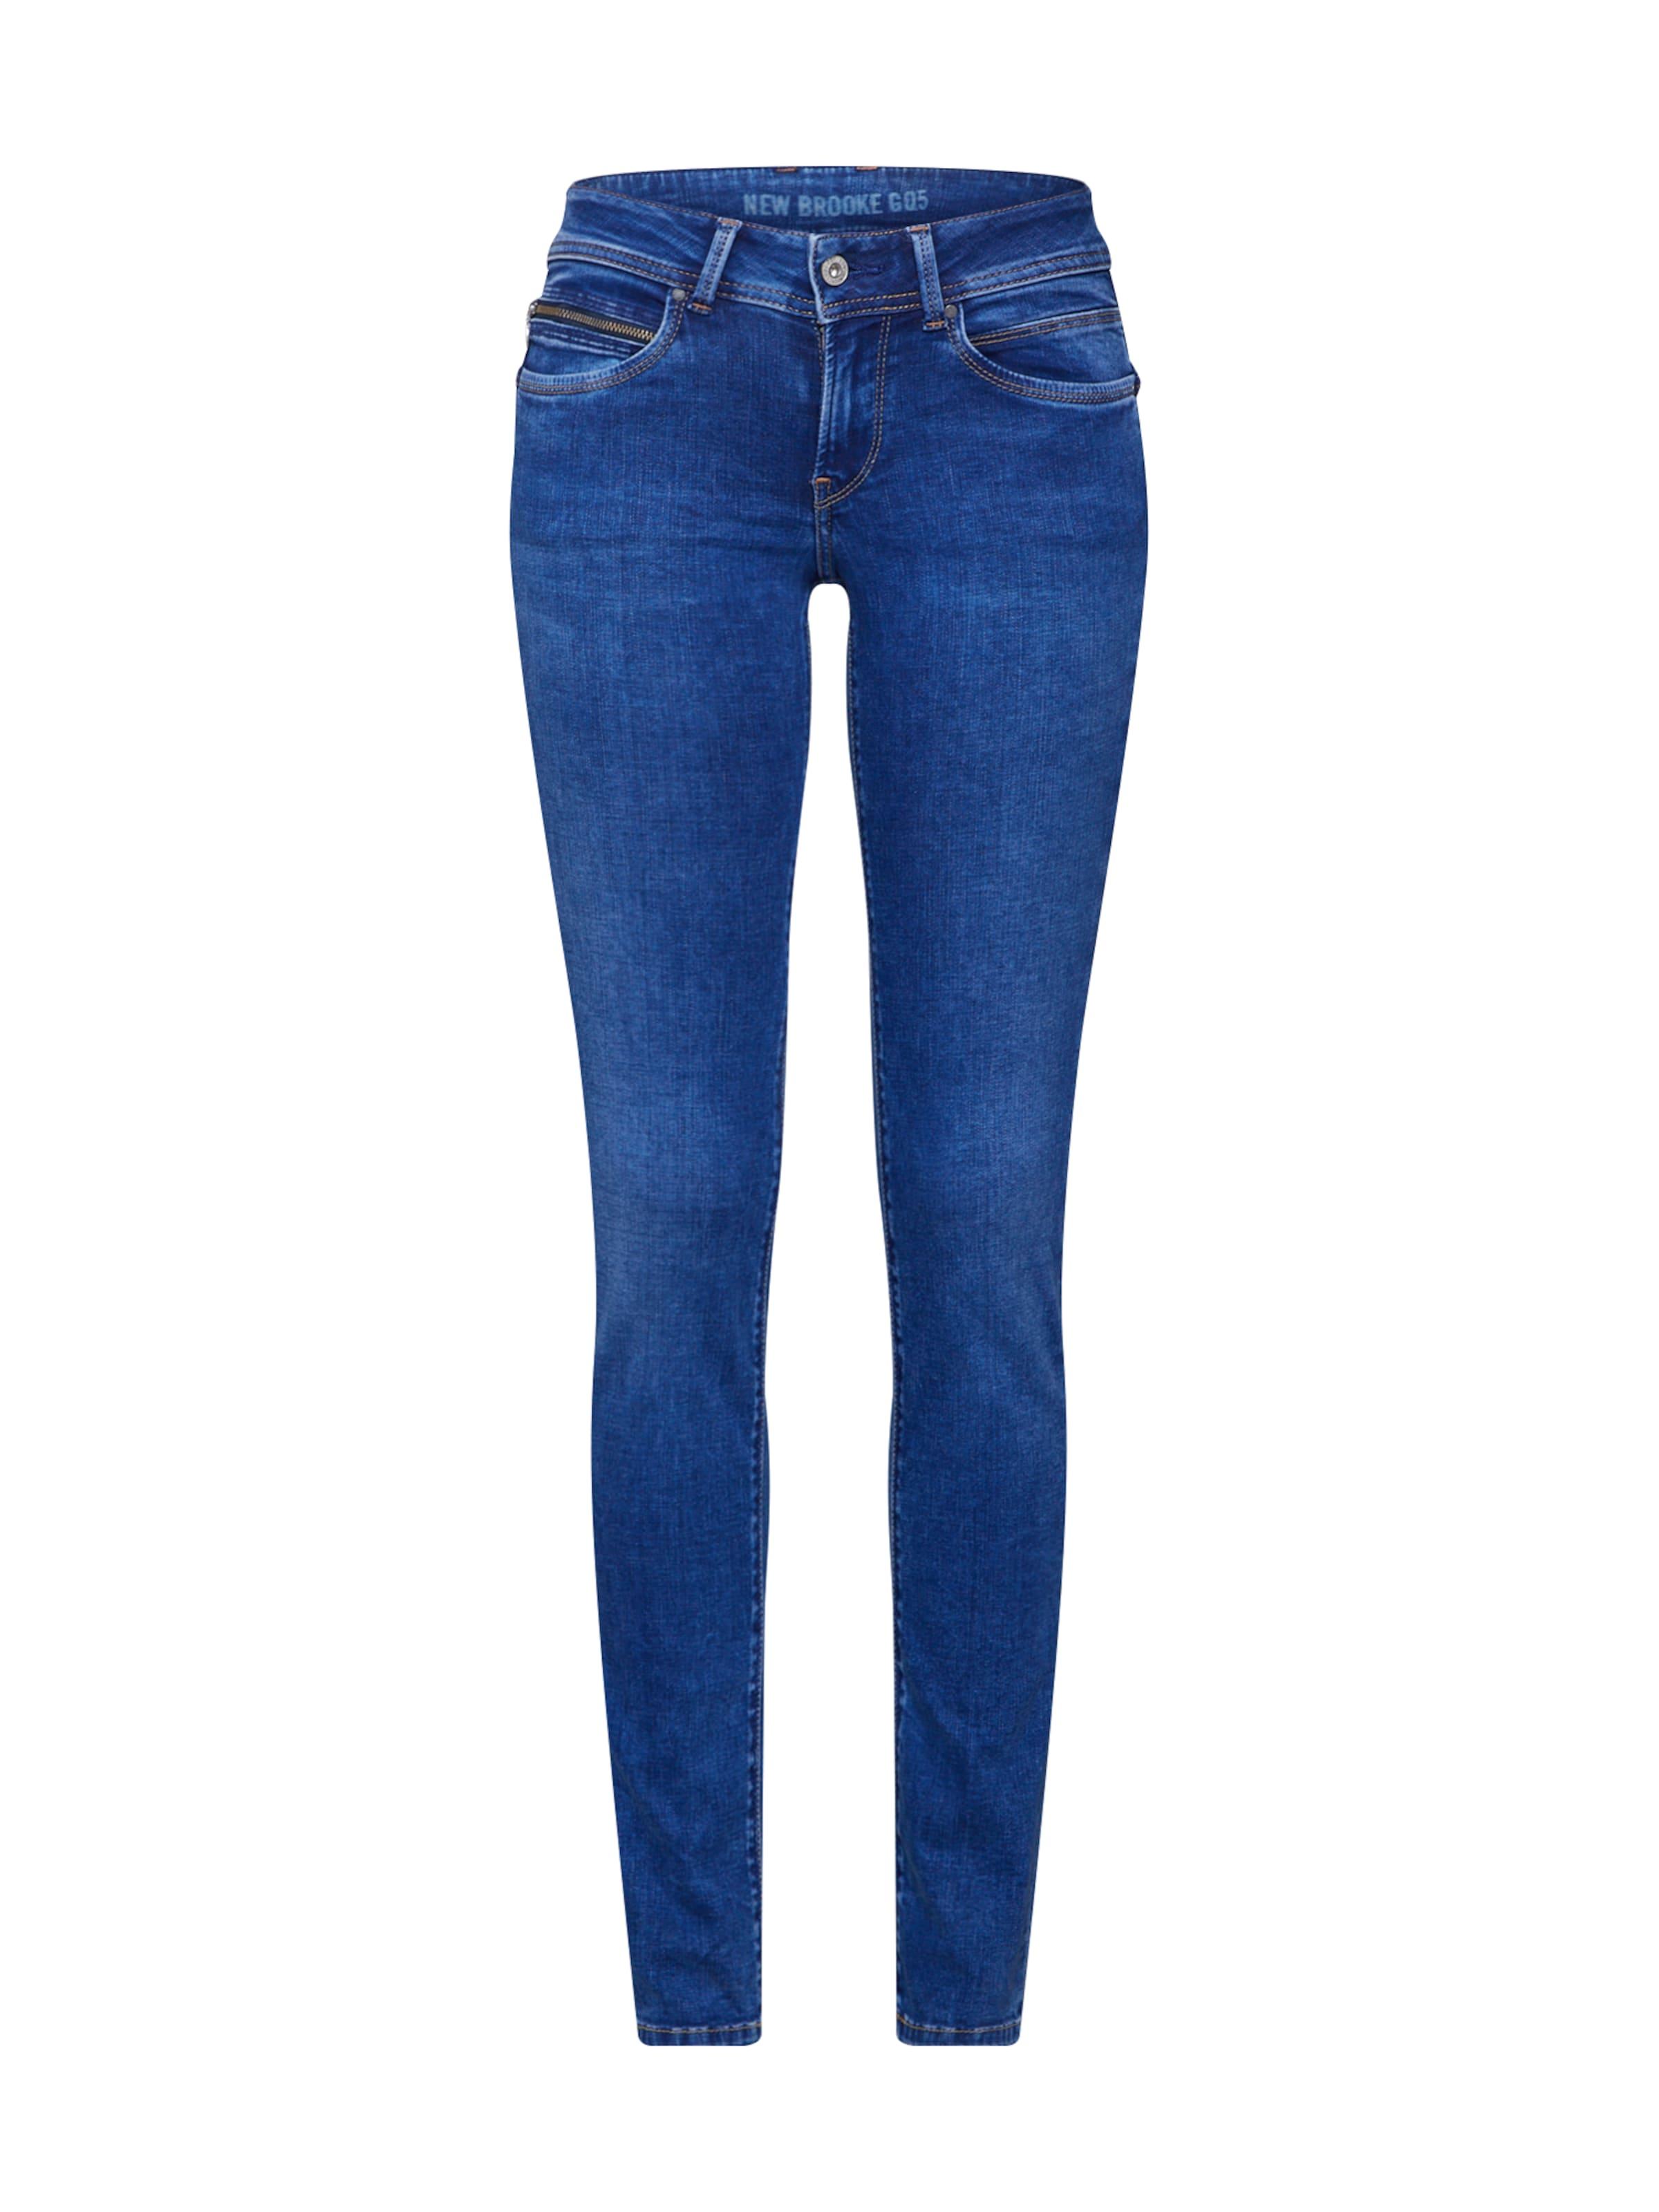 Brooke' 'new Jeans In Pepe Denim Blue 1cKJlF